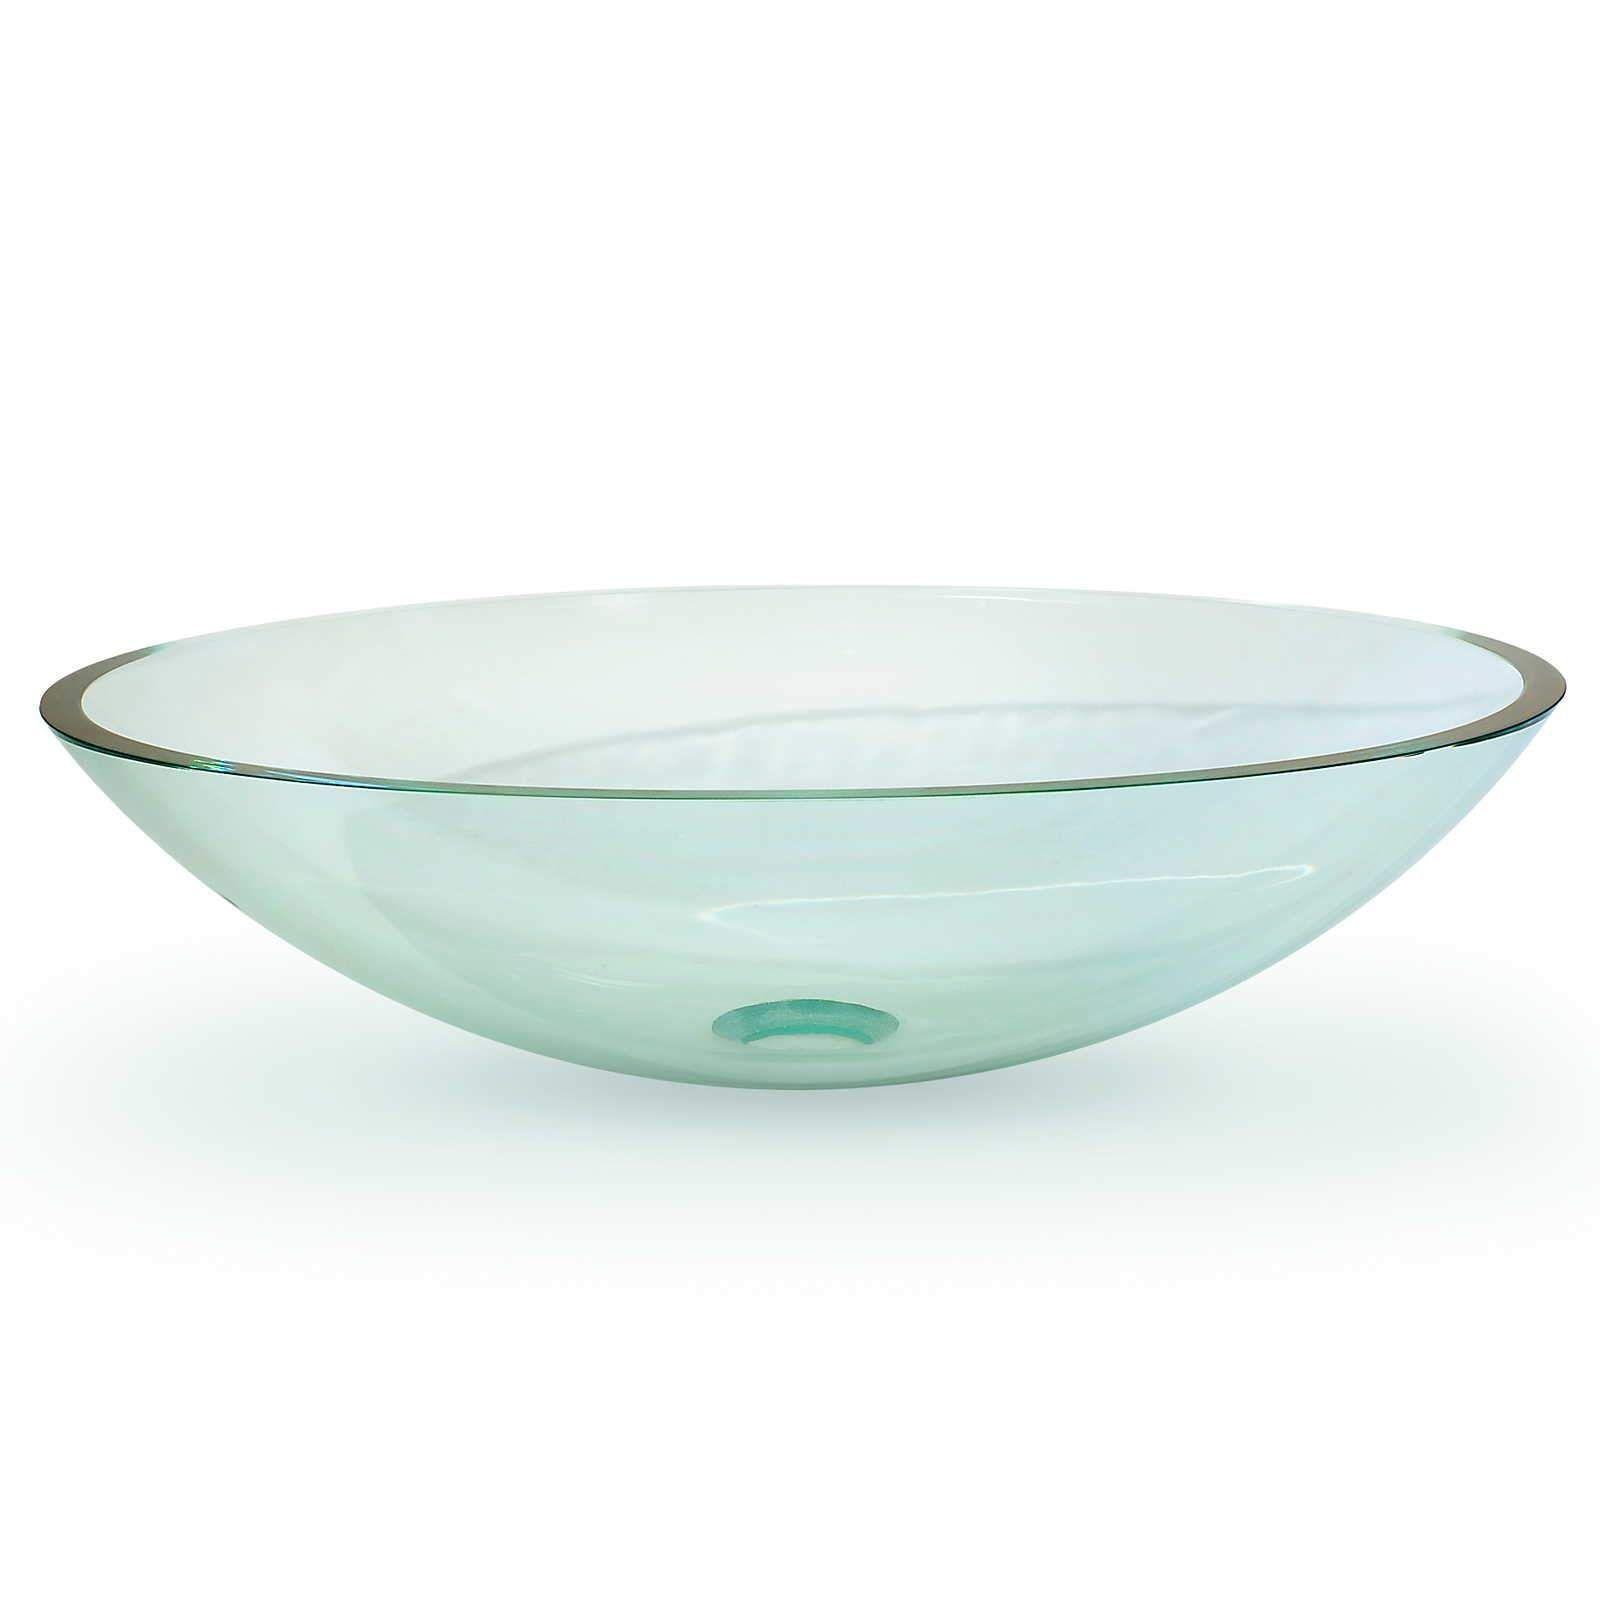 Modern Glass Vessel Sink - Bathroom Vanity Bowl - Oval ...